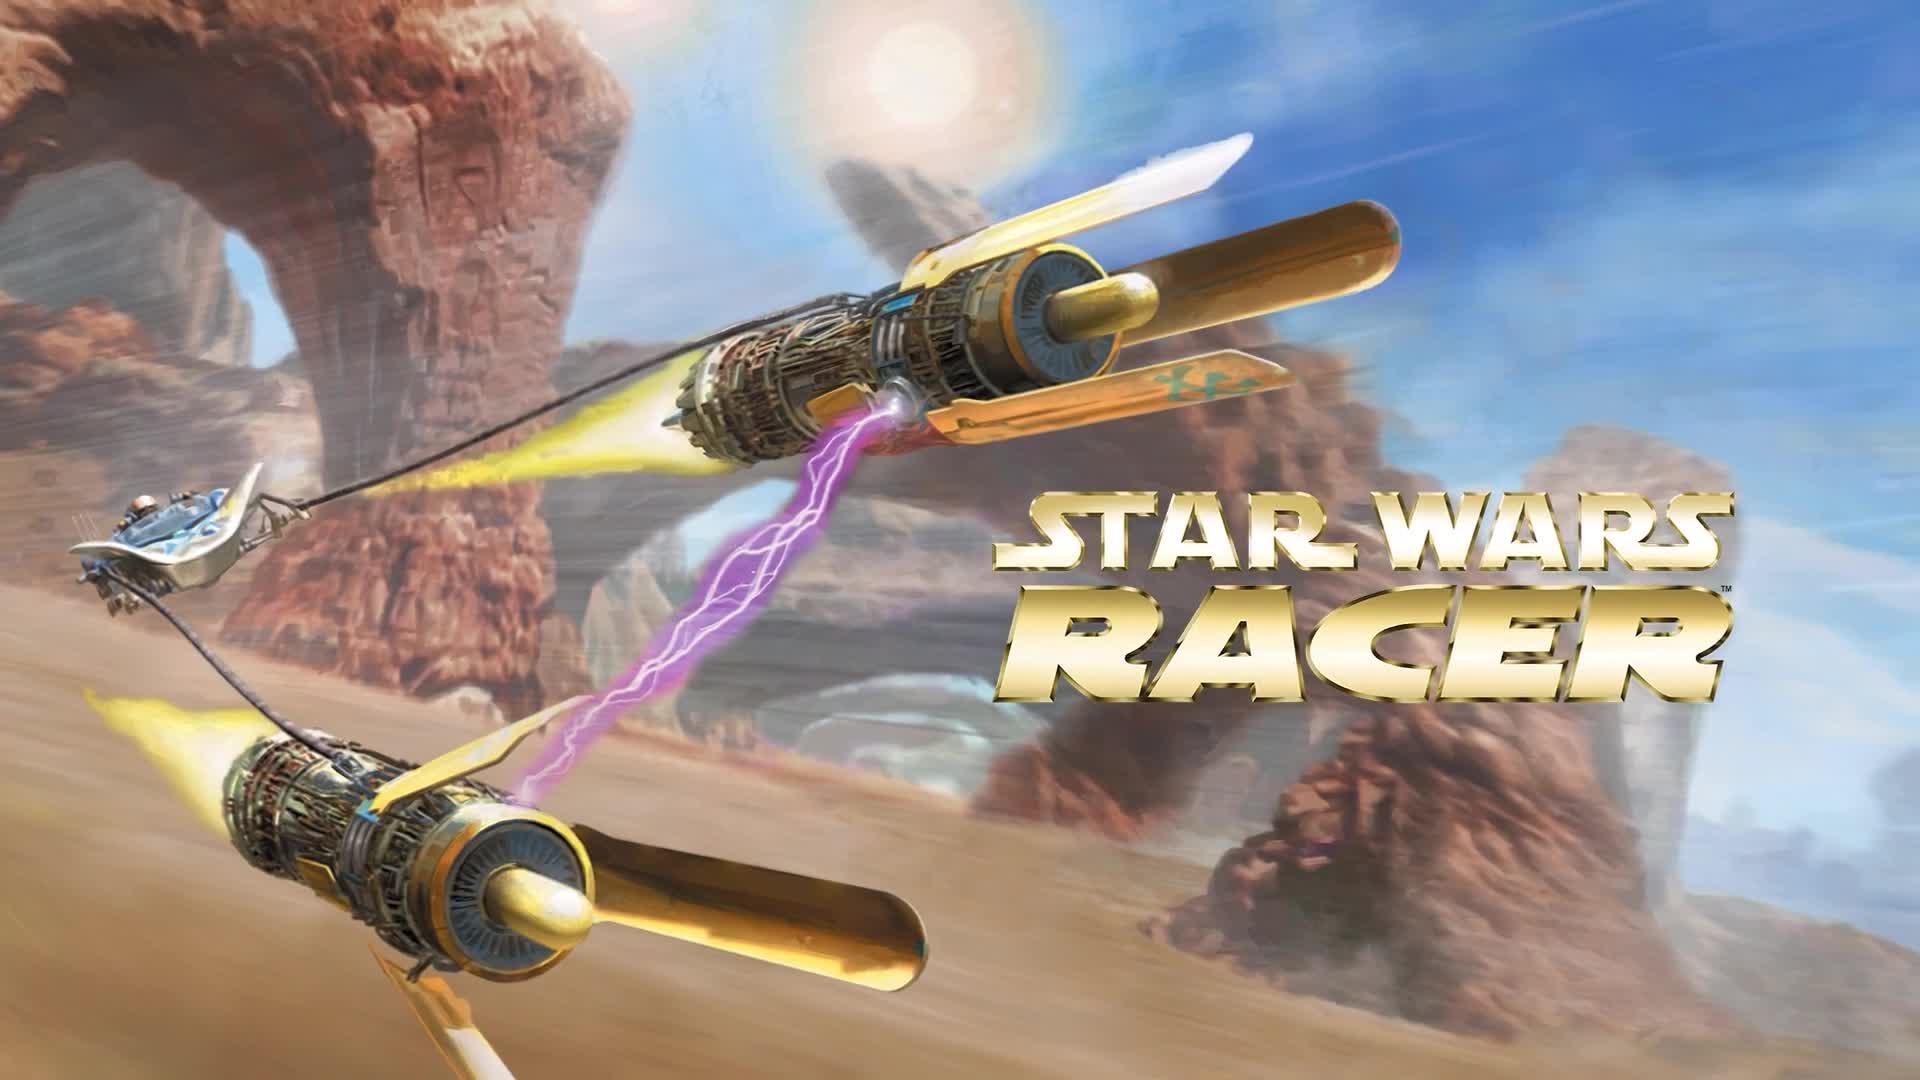 Trailer, Sony, Nintendo, PlayStation 4, PS4, Sony PlayStation 4, Nintendo Switch, Rennspiel, Star Wars, Lucasfilm, STAR WARS EPISODE I: RACER, Star Wars Episode 1: Racer, Star Wars Episode 1, Podrennen, Aspyr